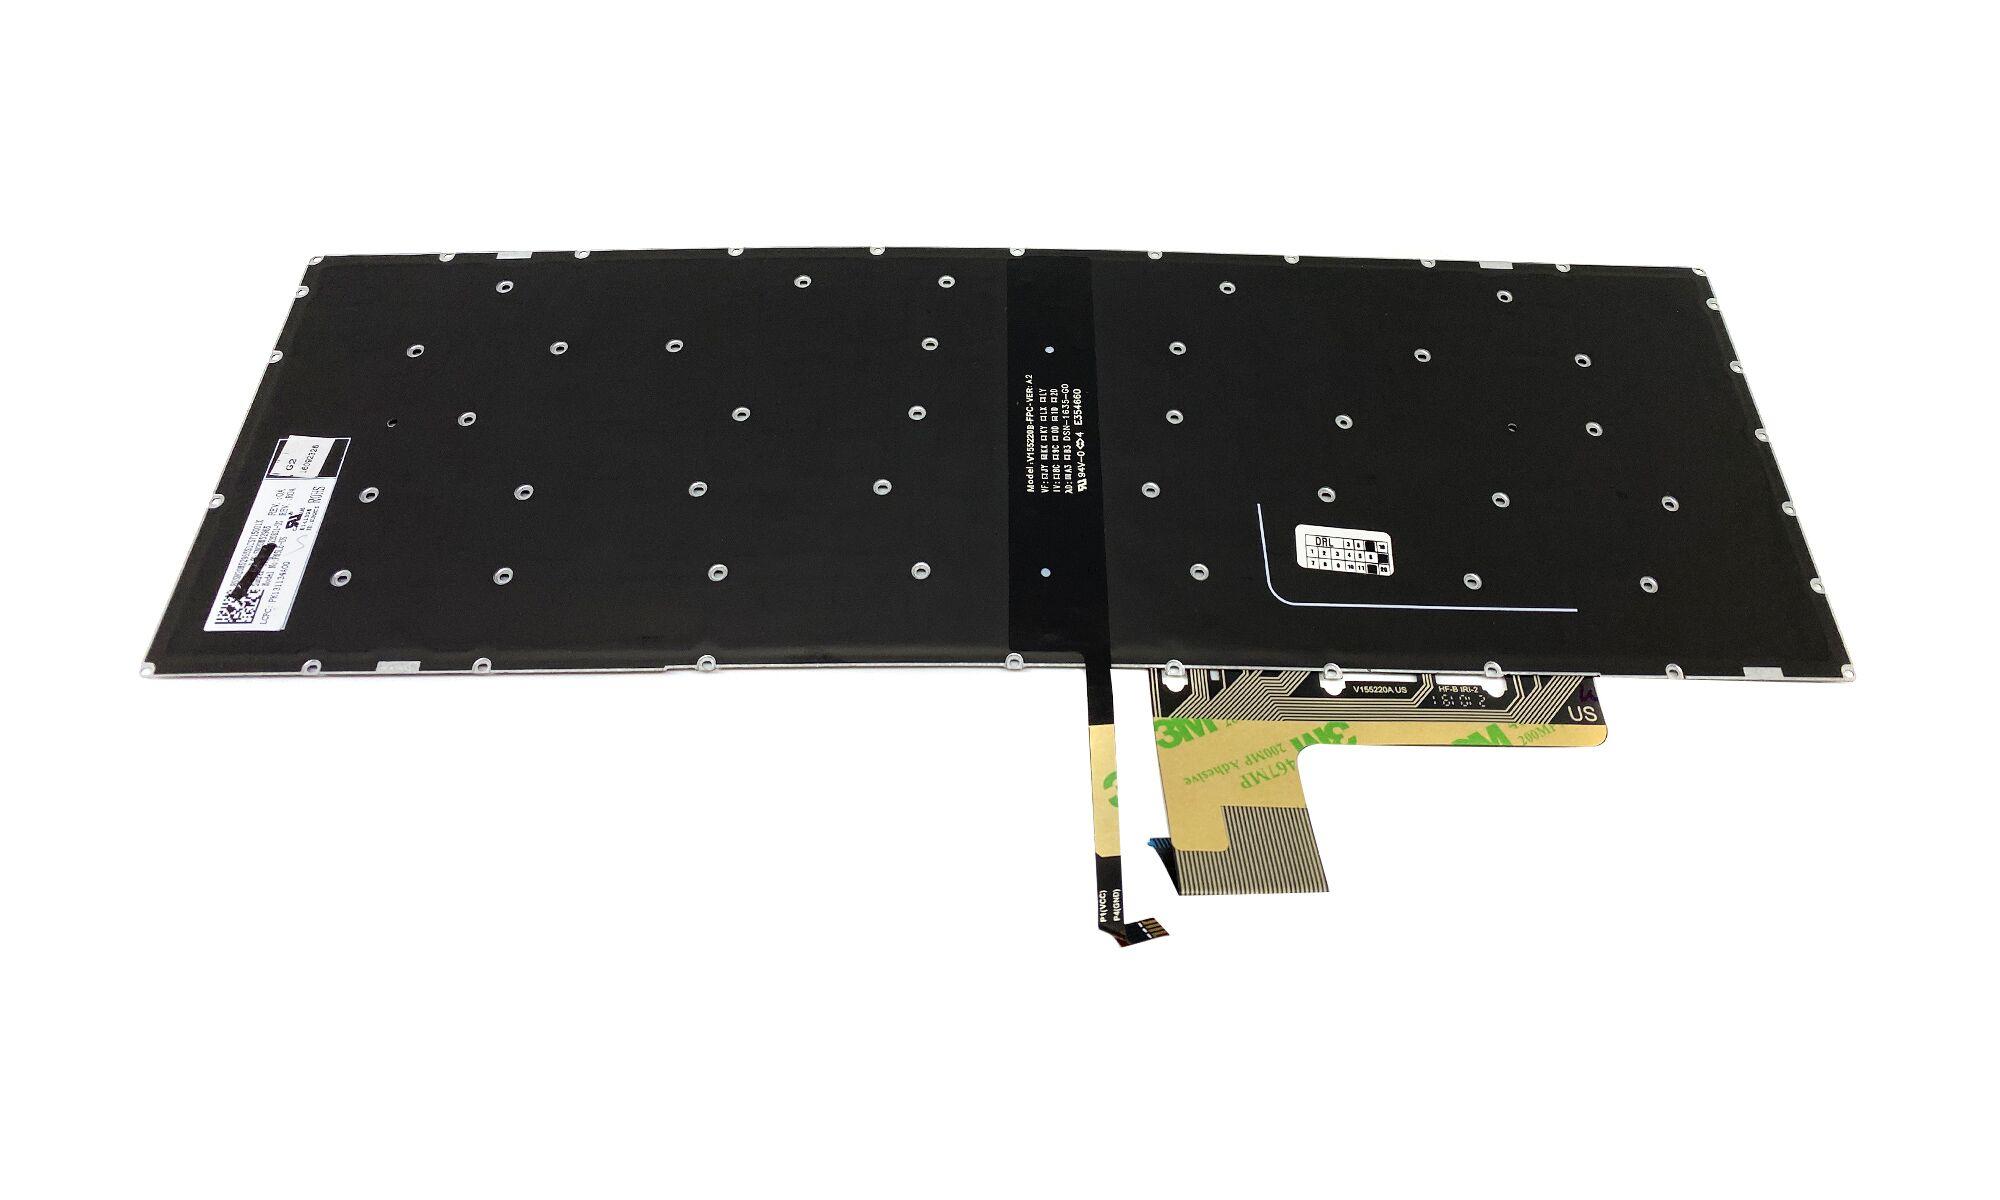 Tastatura compatibila laptop Lenovo IdeaPad 510-15IKB, 510-15ISK, iluminata, Standard US, model SN20M52965